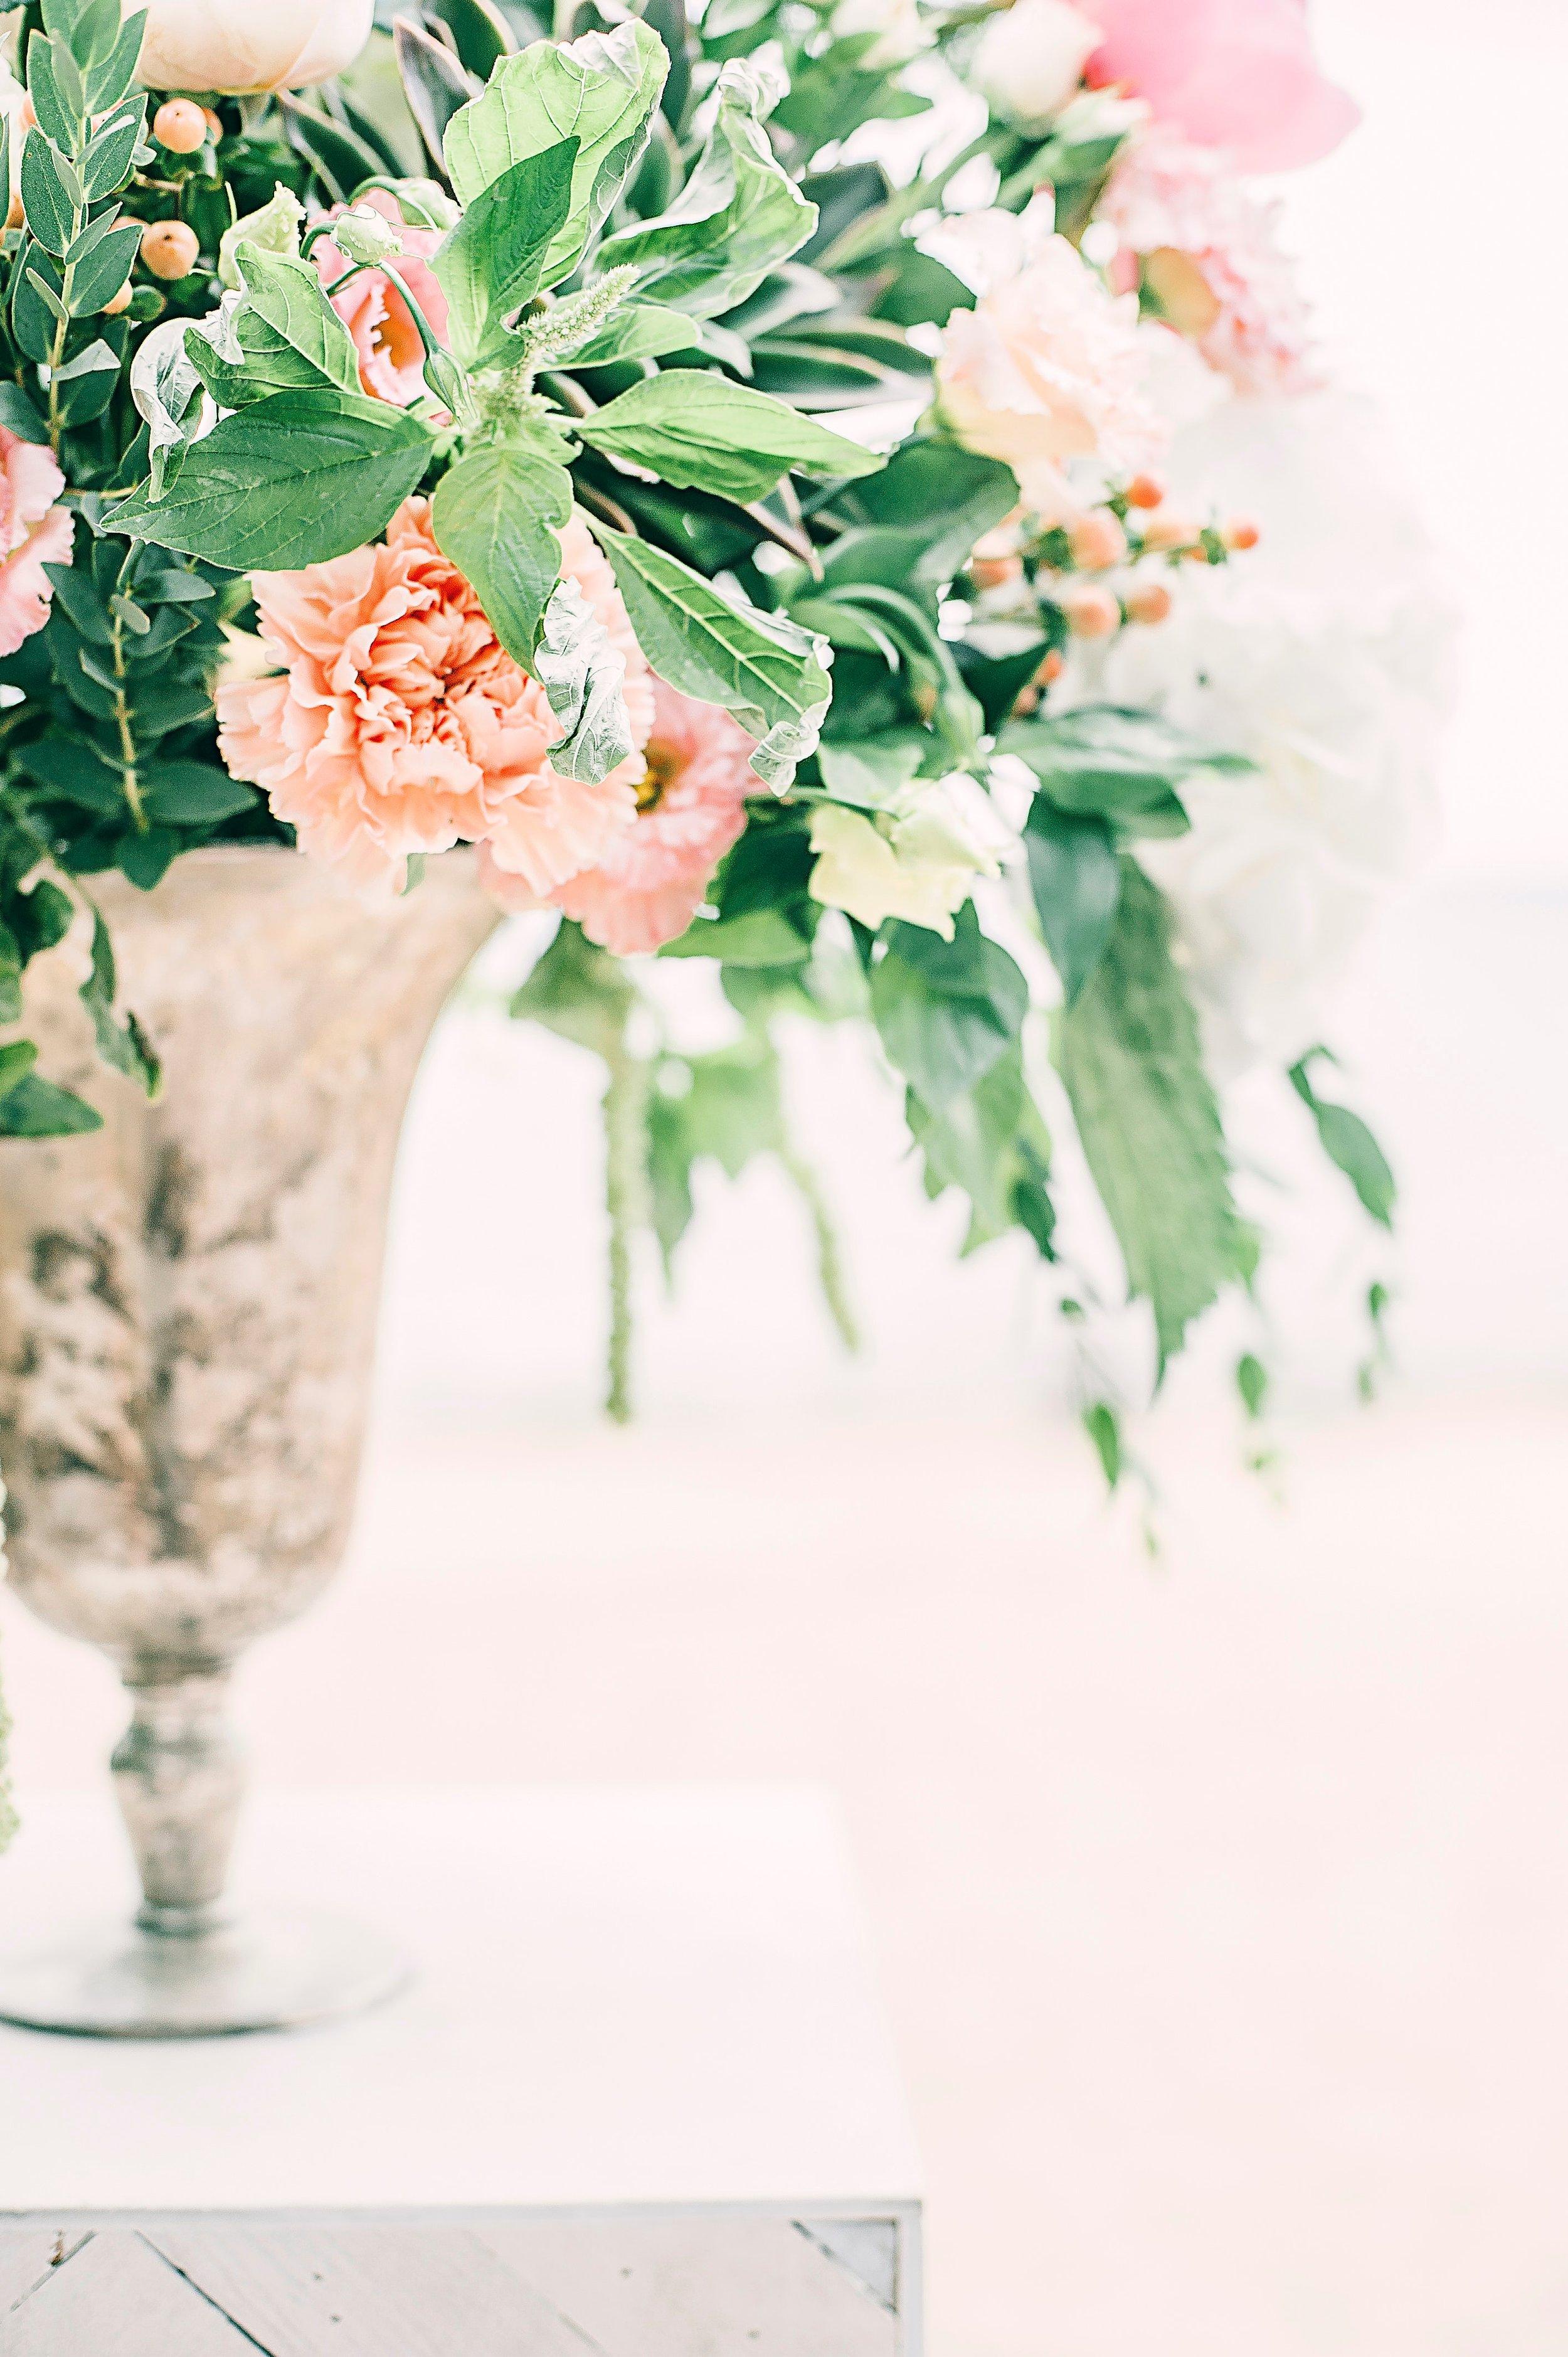 beautiful-bouquet-bright-1070863.jpg